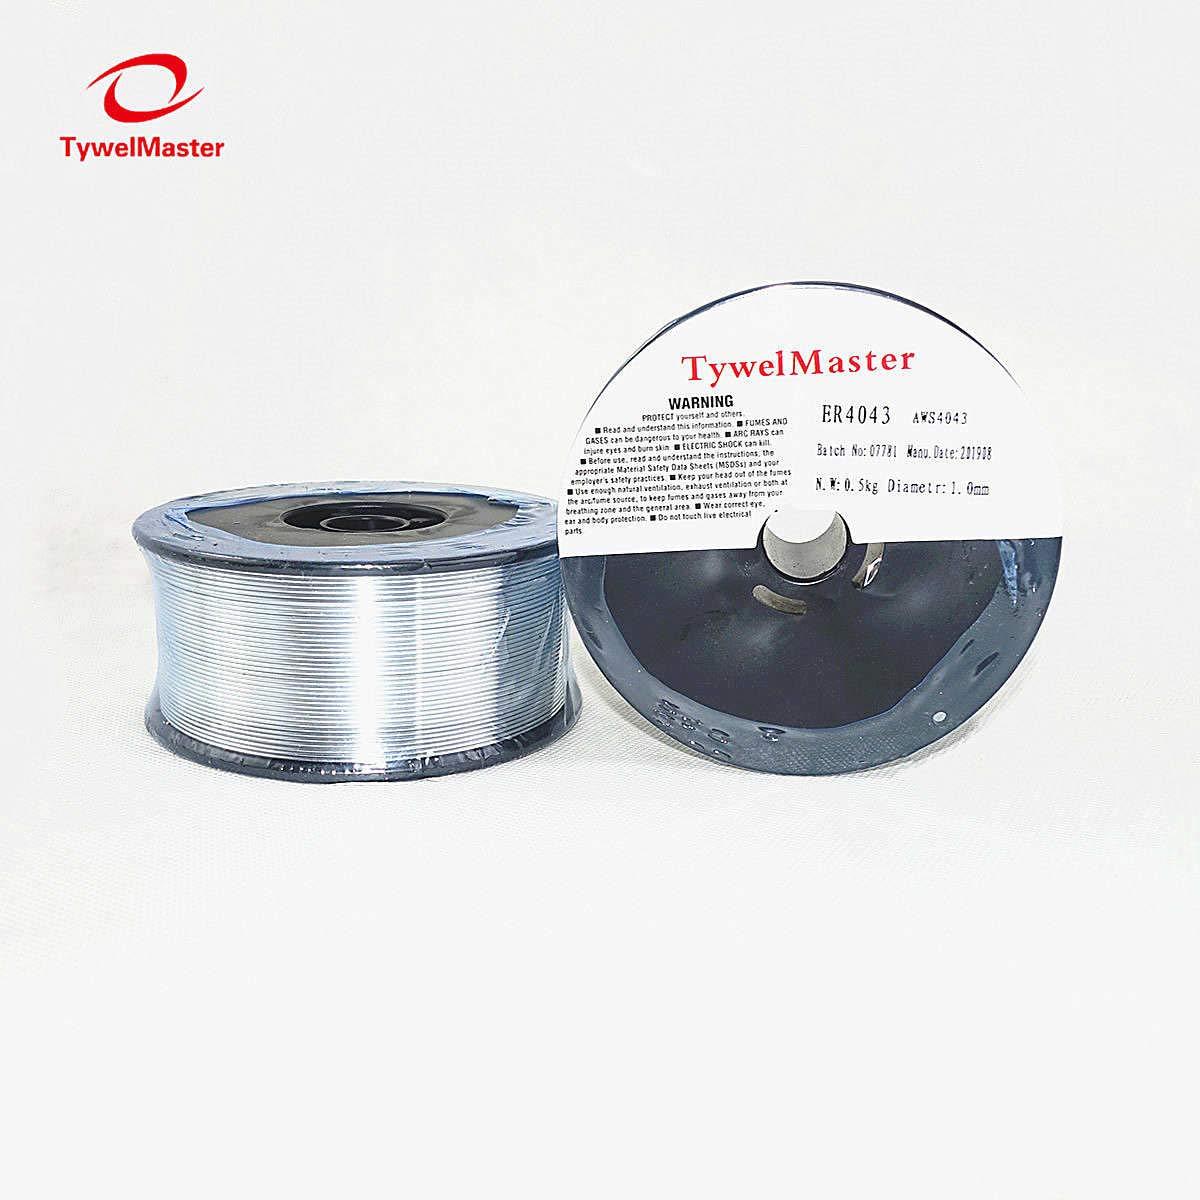 0,5 kg de di/ámetro, 0,8//1,0//1,2 mm AWS A5.10 ER5356 Alambre de soldadura MIG de aluminio para soldadura TIG MIG